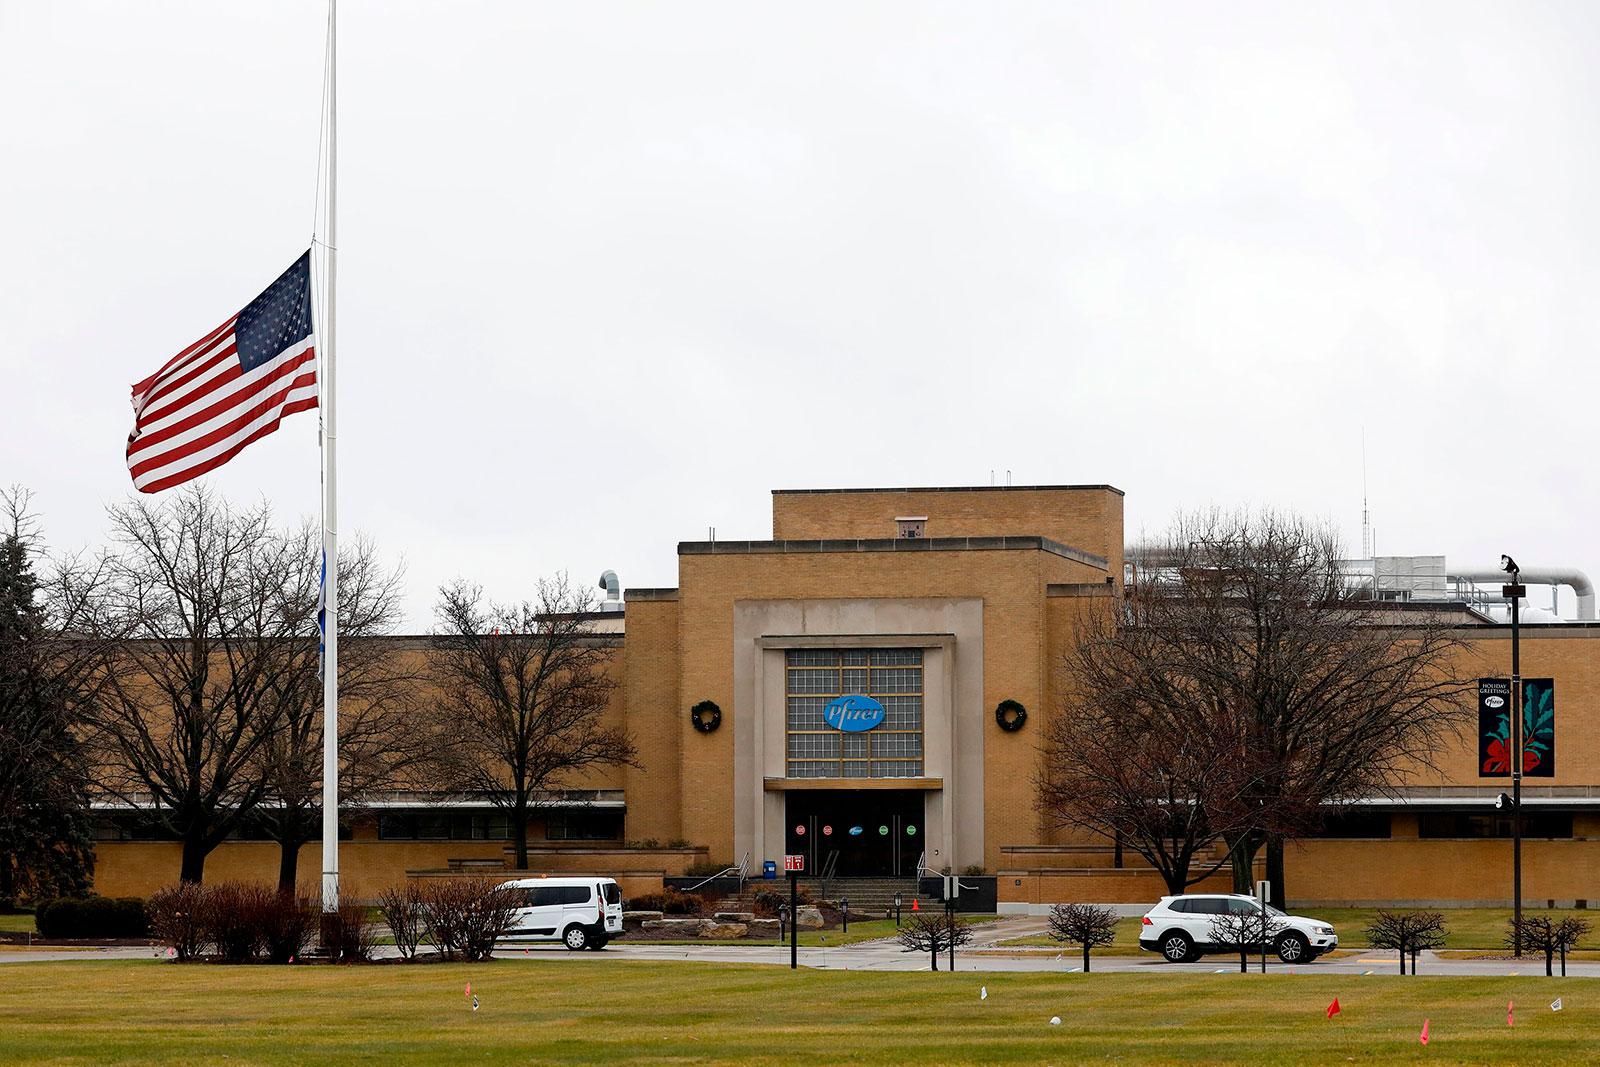 Pfizer's Global Supply facility in Kalamazoo, Michigan, on December 12.